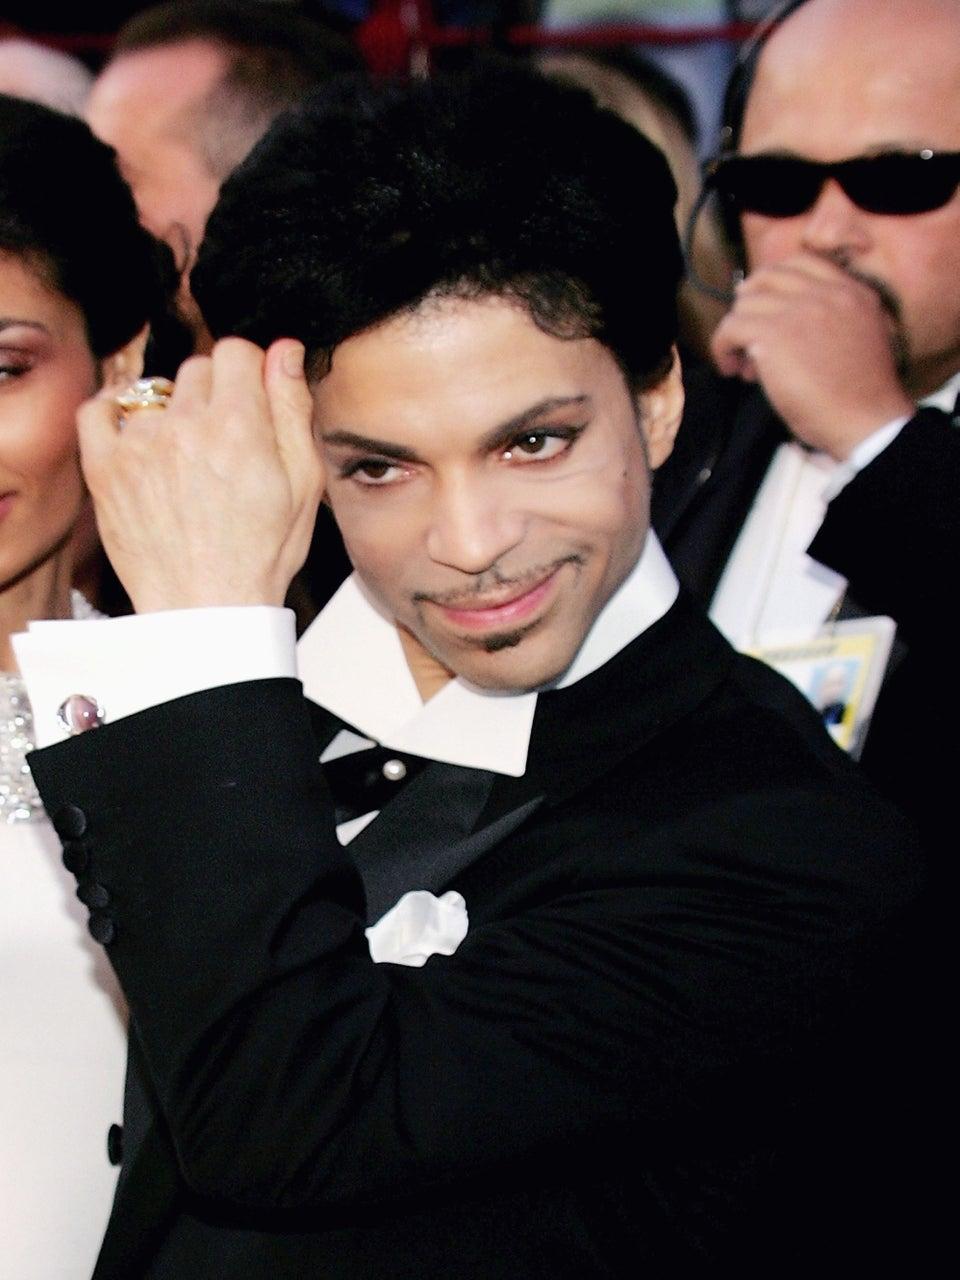 Prince Allegedly Hid Opiates In Aspirin Bottles